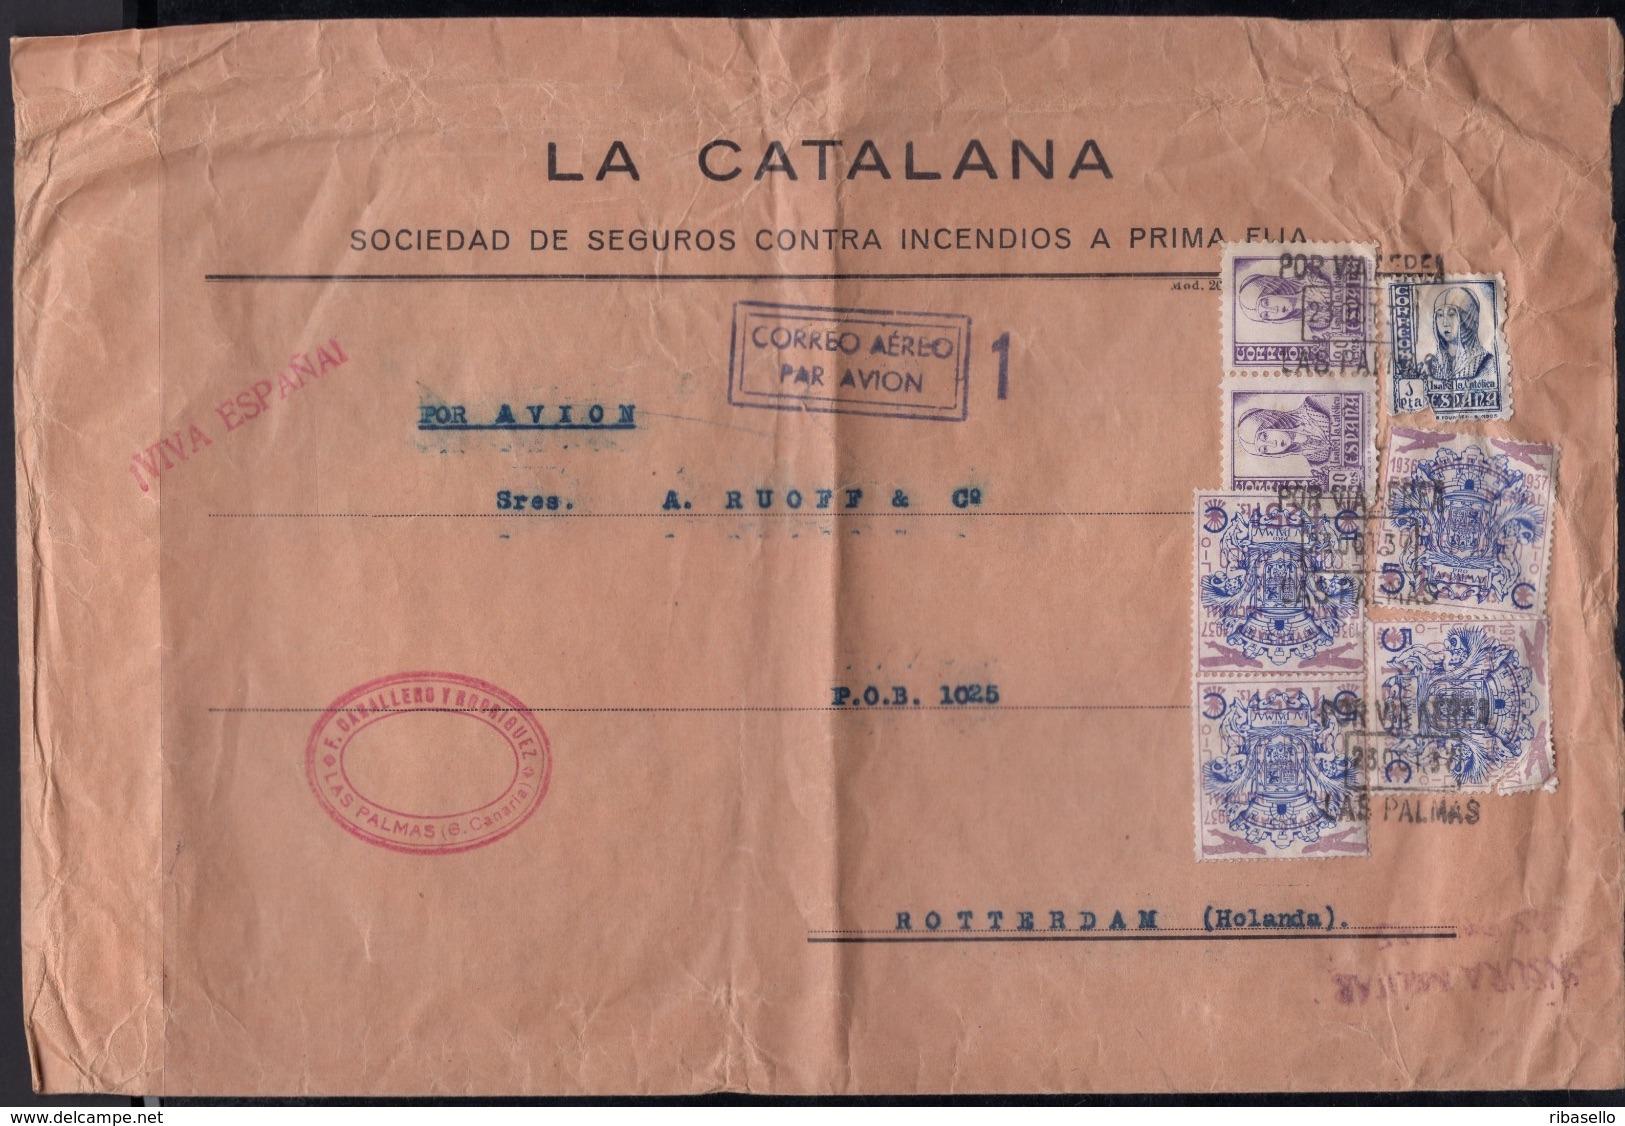 España 1937. Canarias. Carta De Las Palmas A Rotterdam. Censura. - Marcas De Censura Nacional